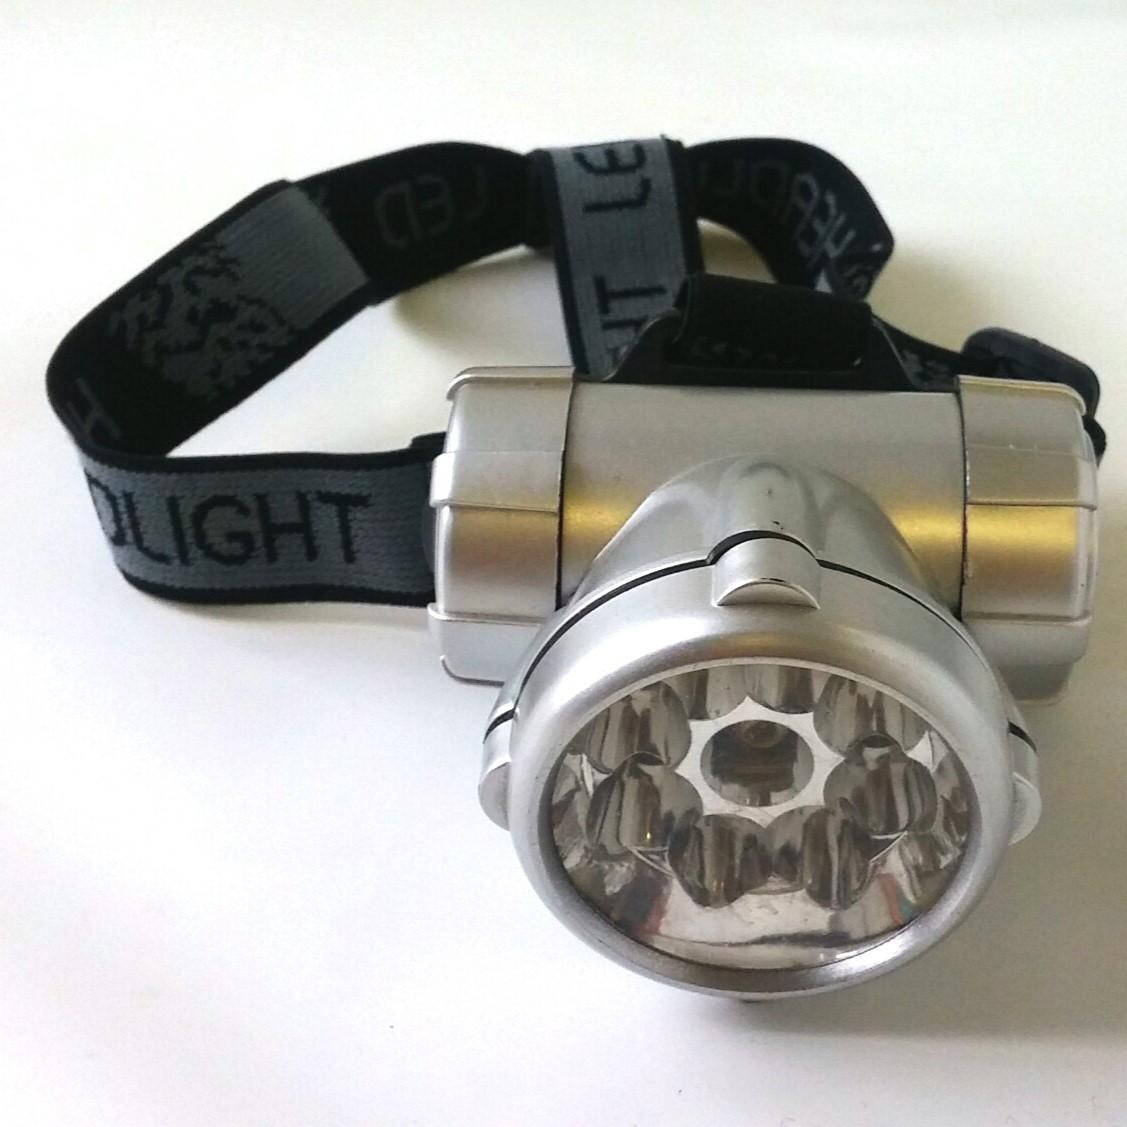 Lampe frontale 8 leds + pointeur laser